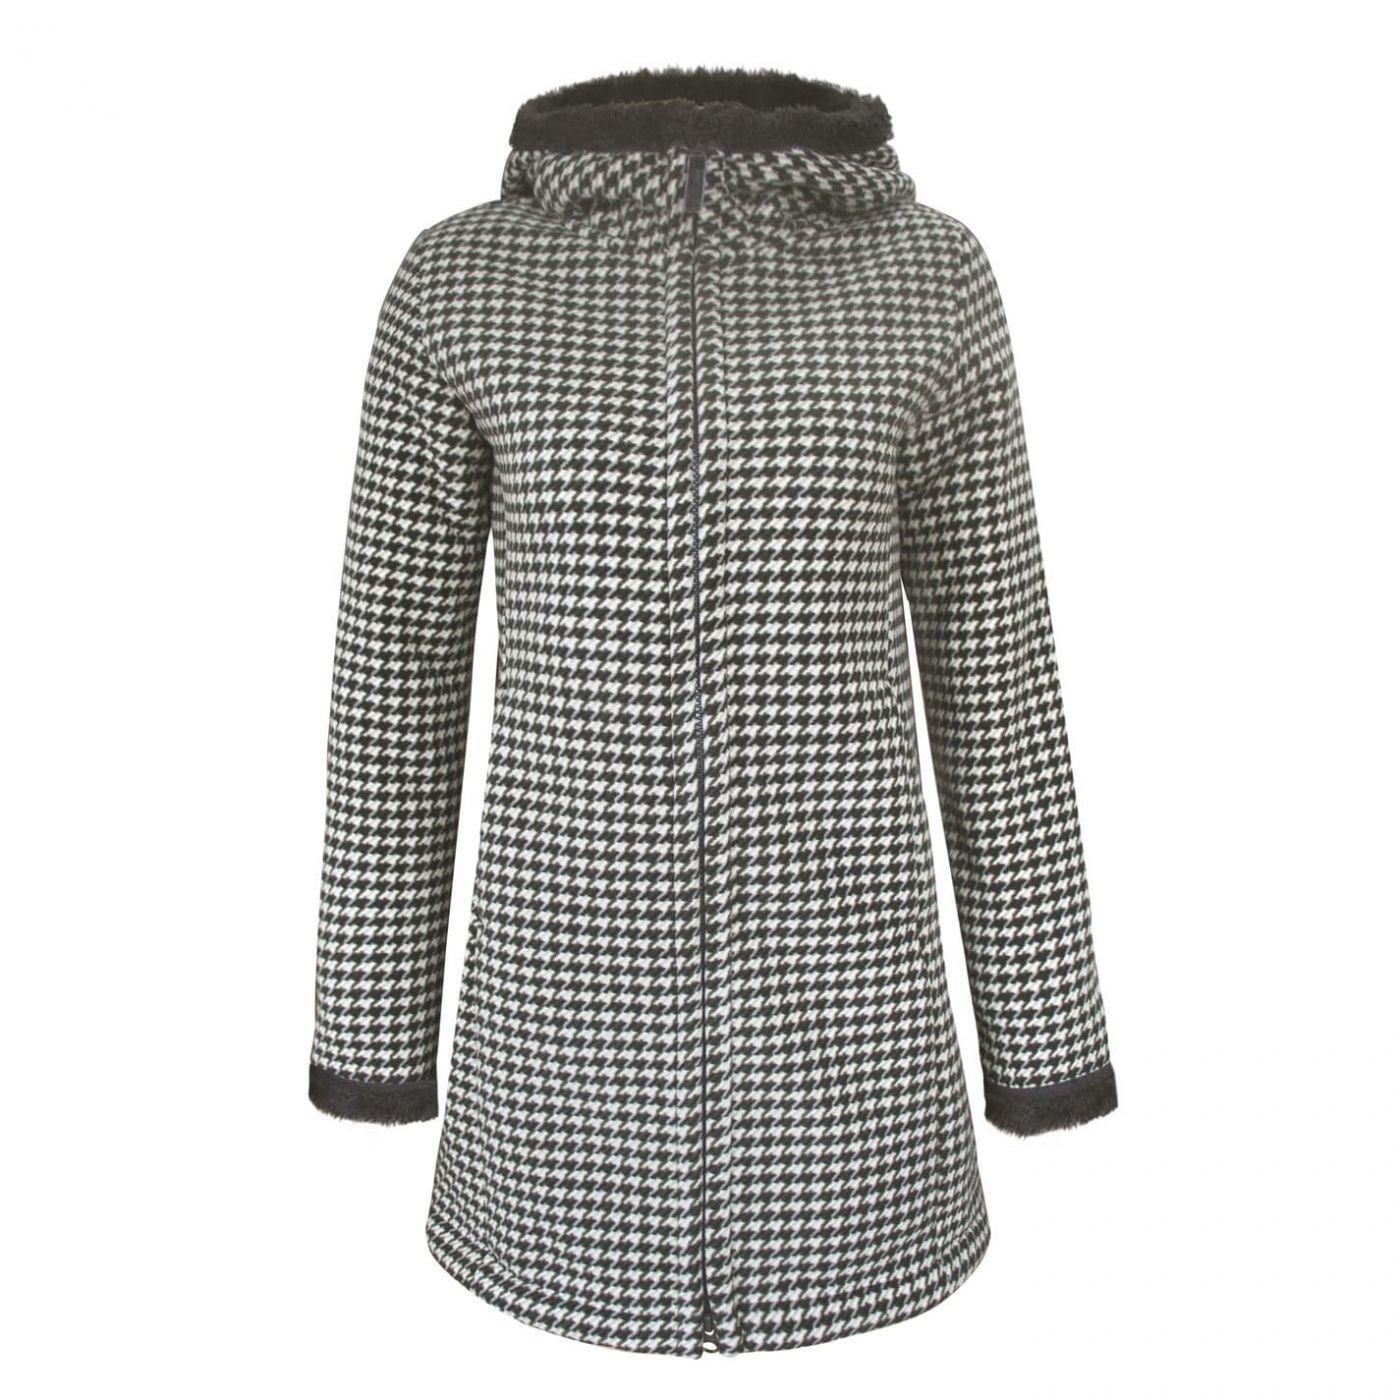 Lee Cooper Heavy Faux Fur Lined Coat Ladies